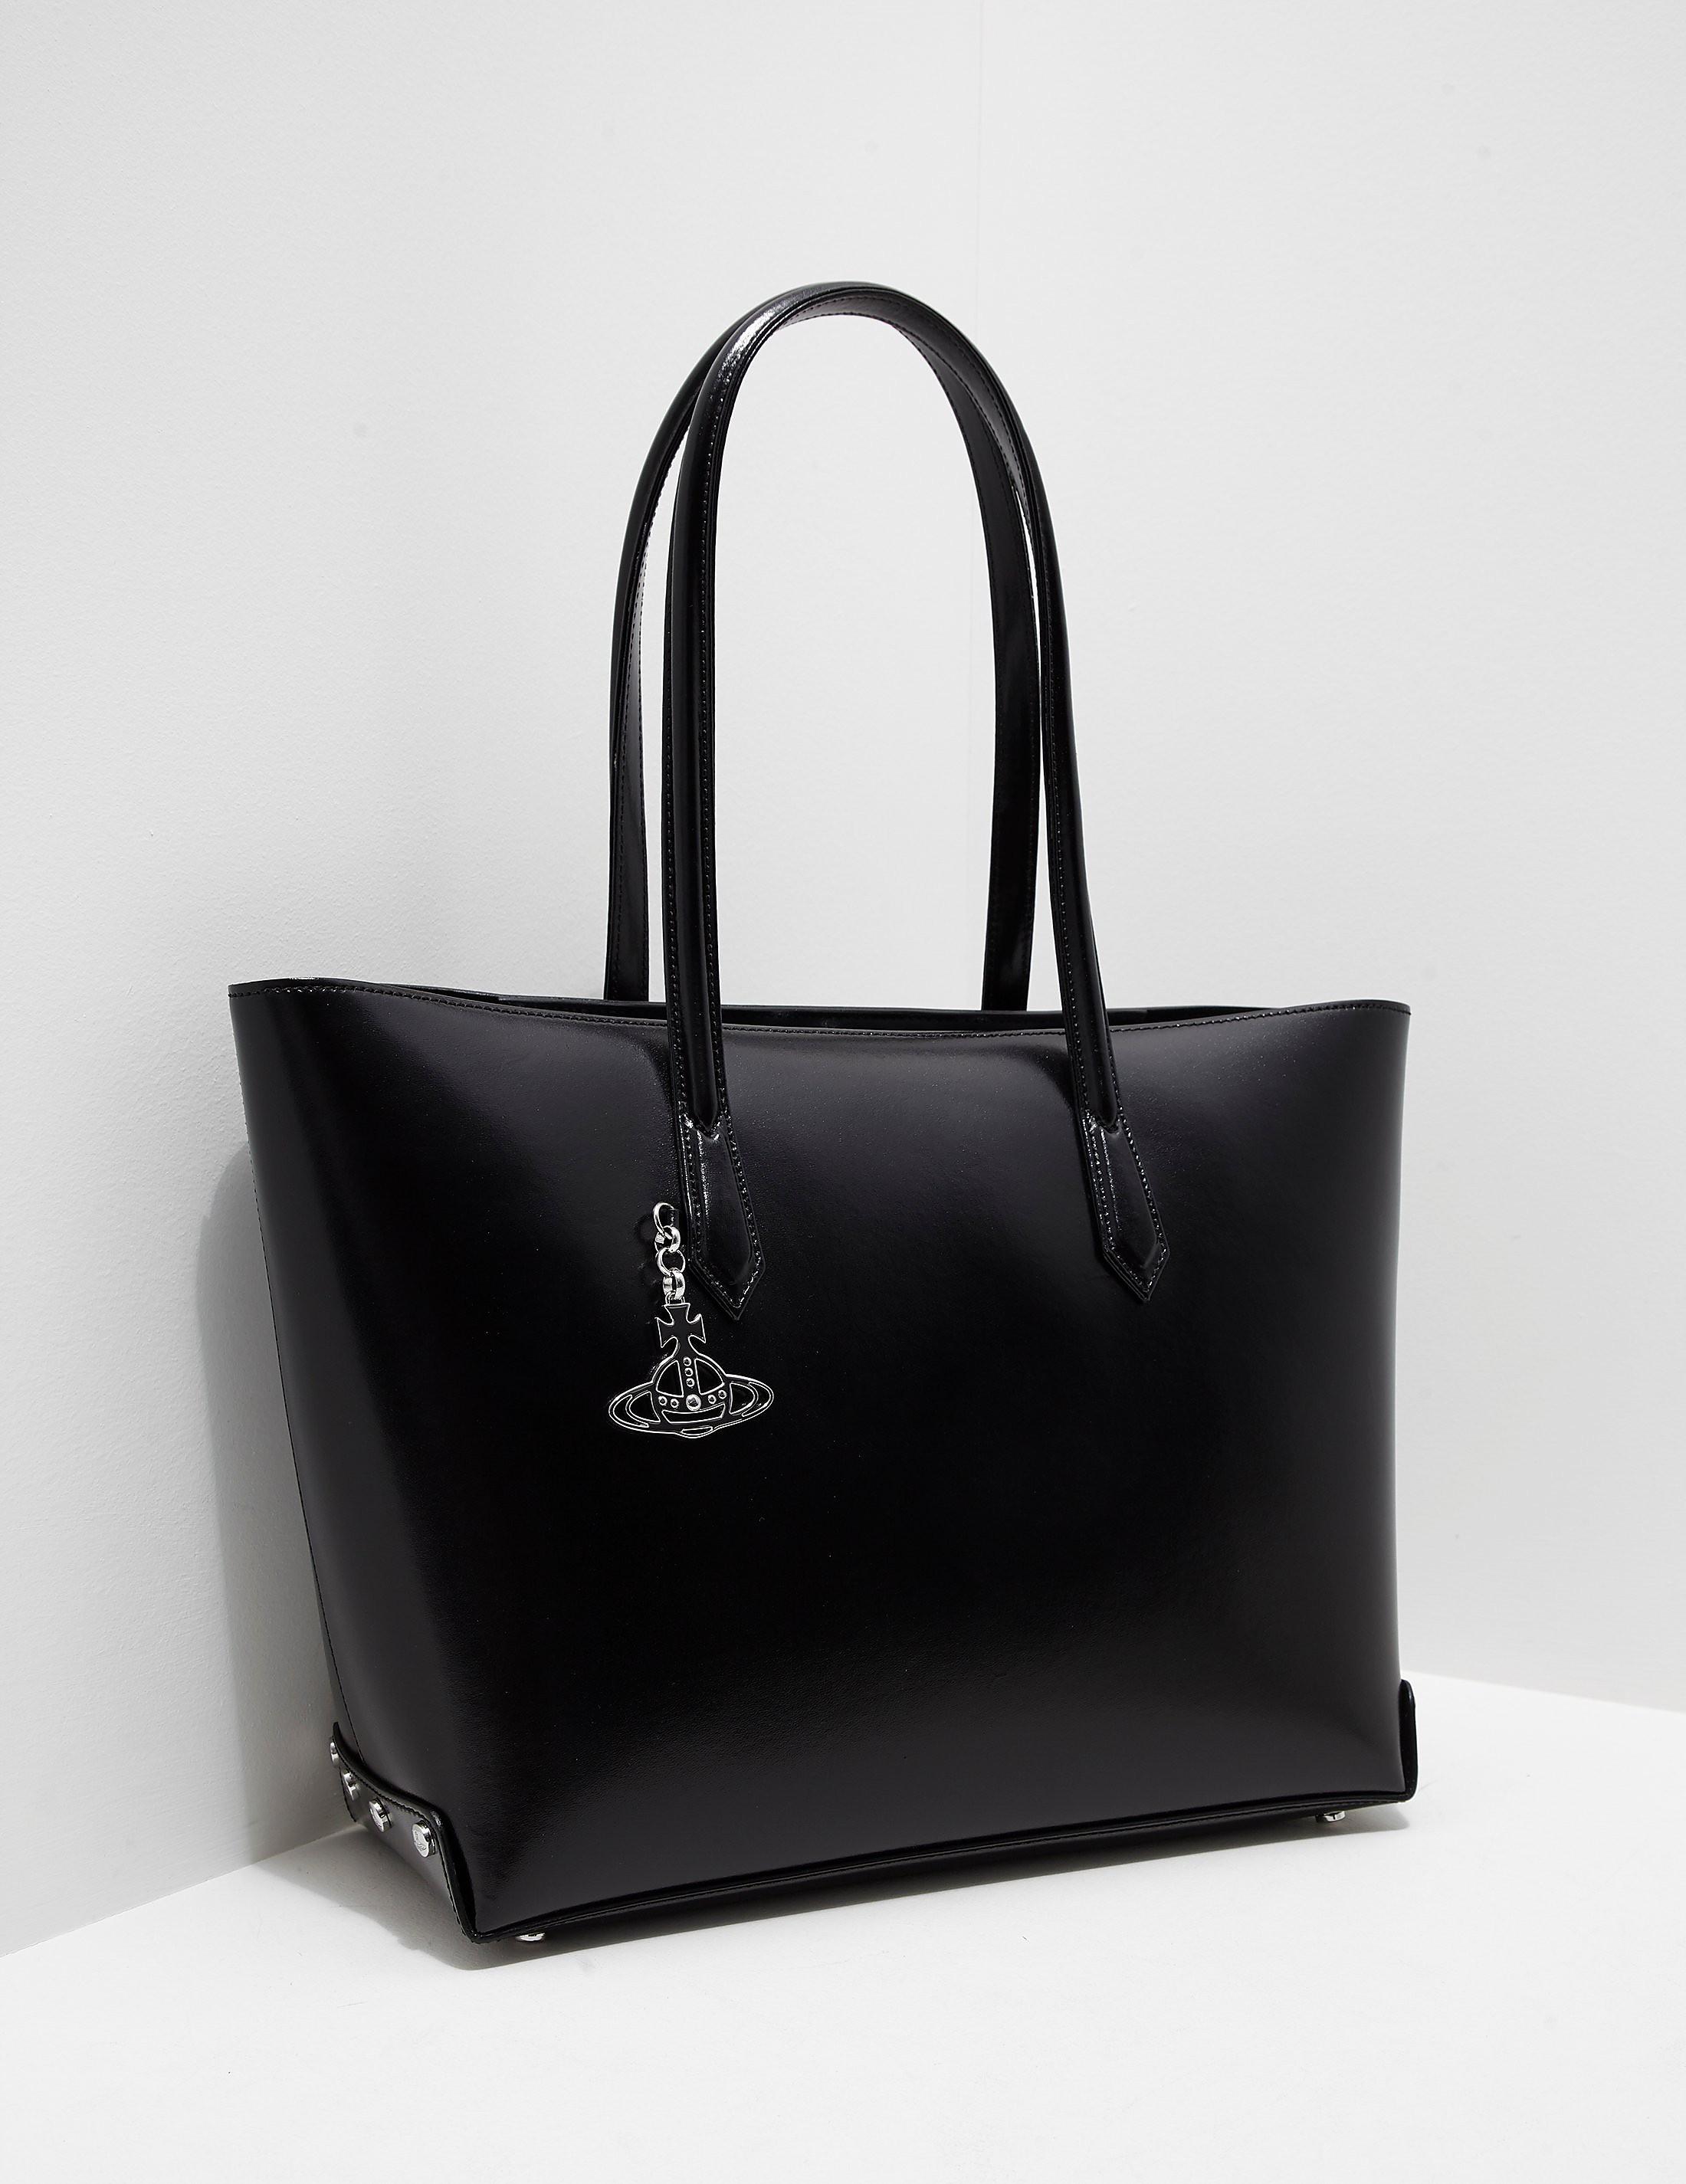 Vivienne Westwood Sarah Large Shopper Bag